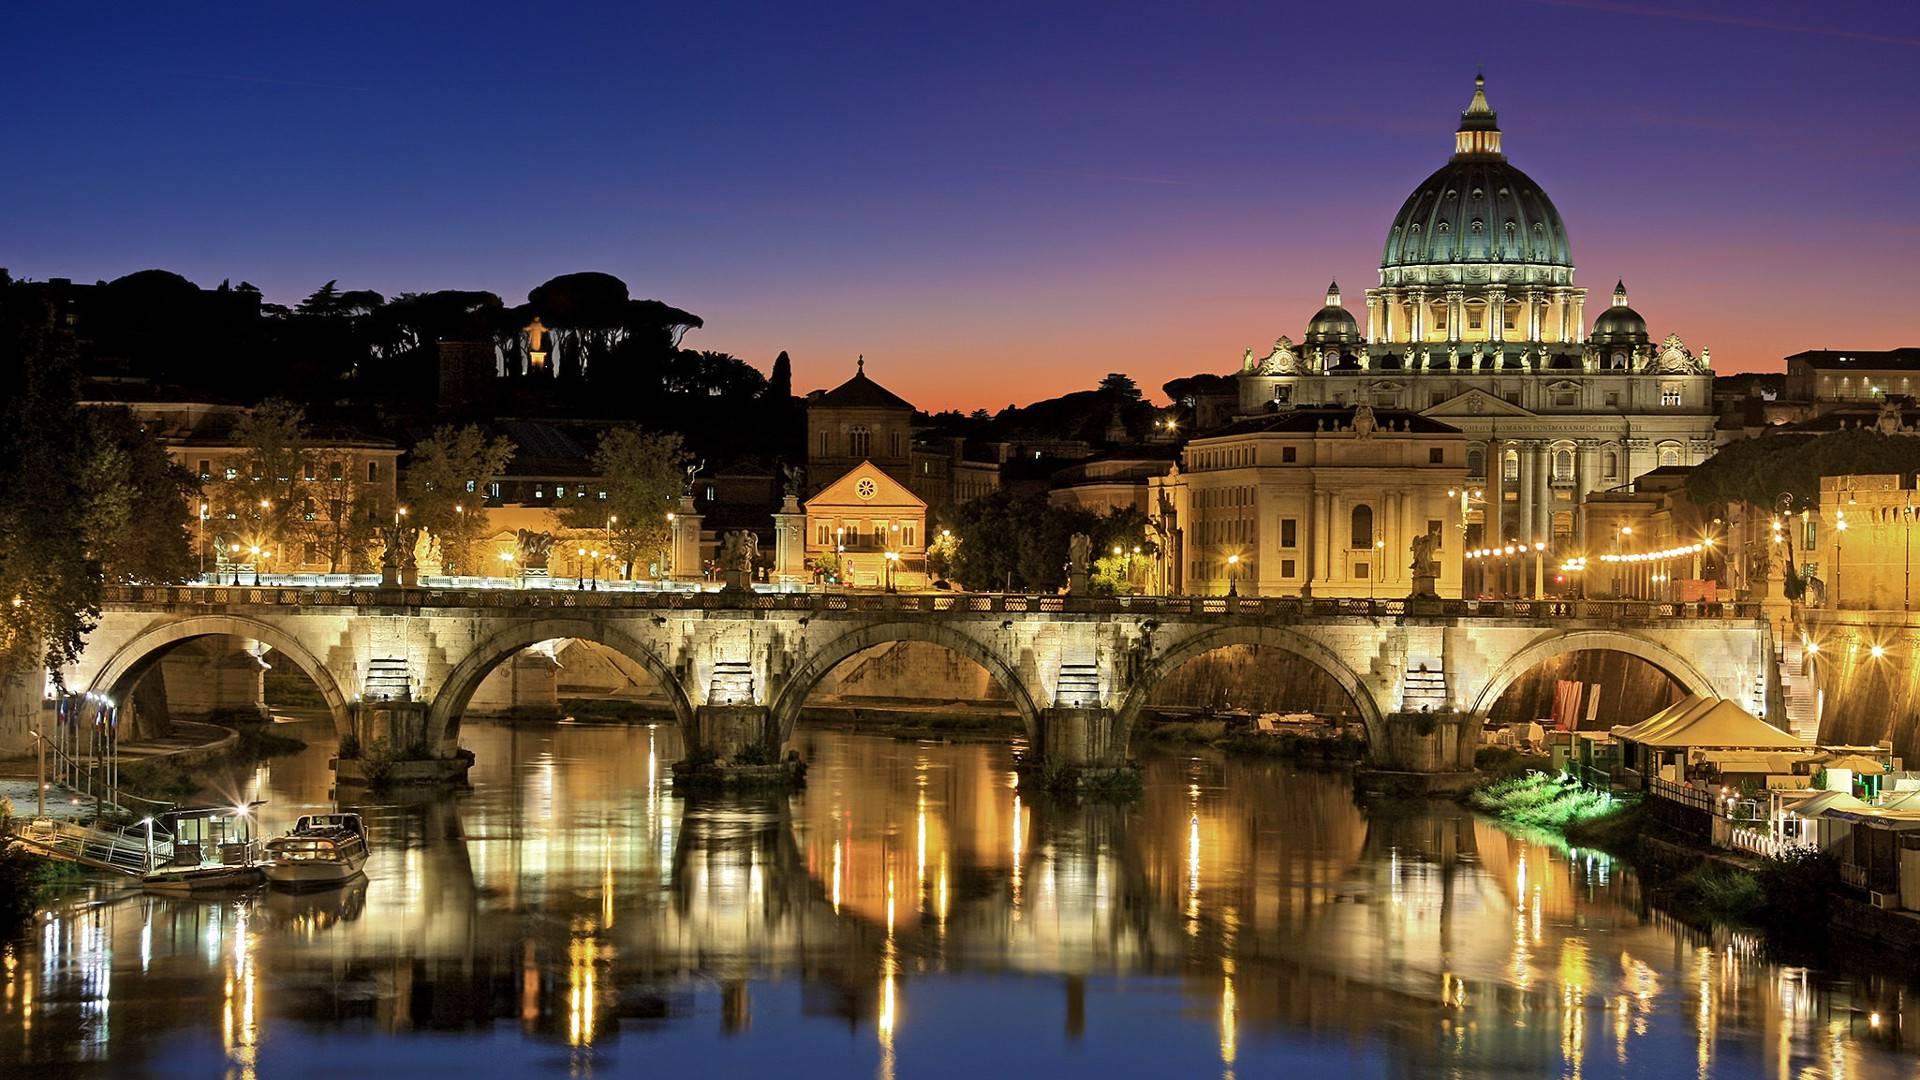 LBH-Hotel-Vespasiano-rome-st-peter-basilica-753639